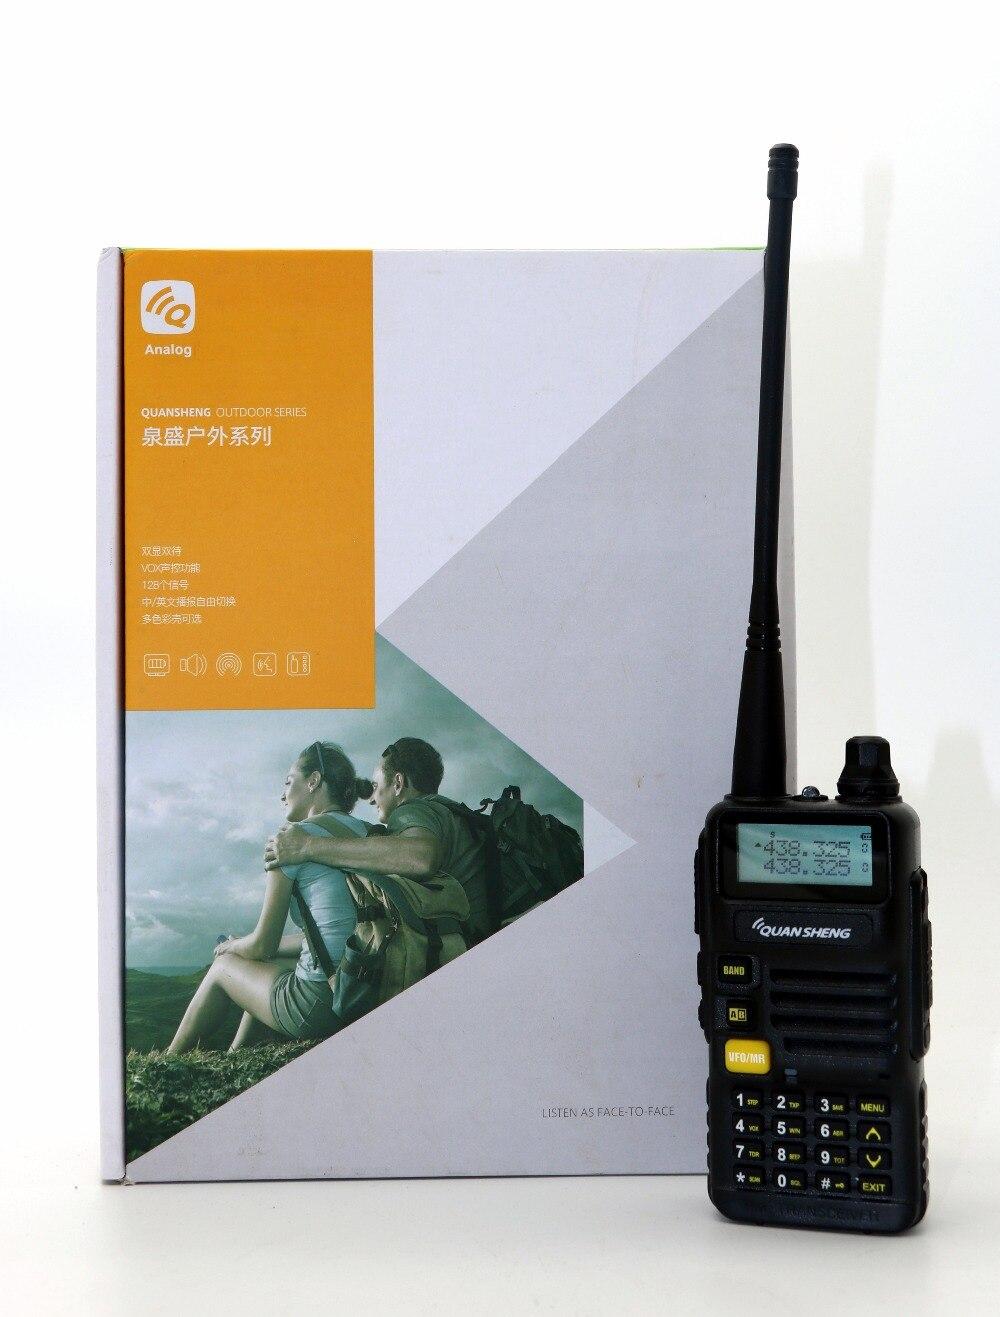 UV-R50 Quansheng Walkie Talkie Dual Band UVR50 CB Radio 128CH VOX 5 W Portatile Ricetrasmettitore FM Professionale per la caccia